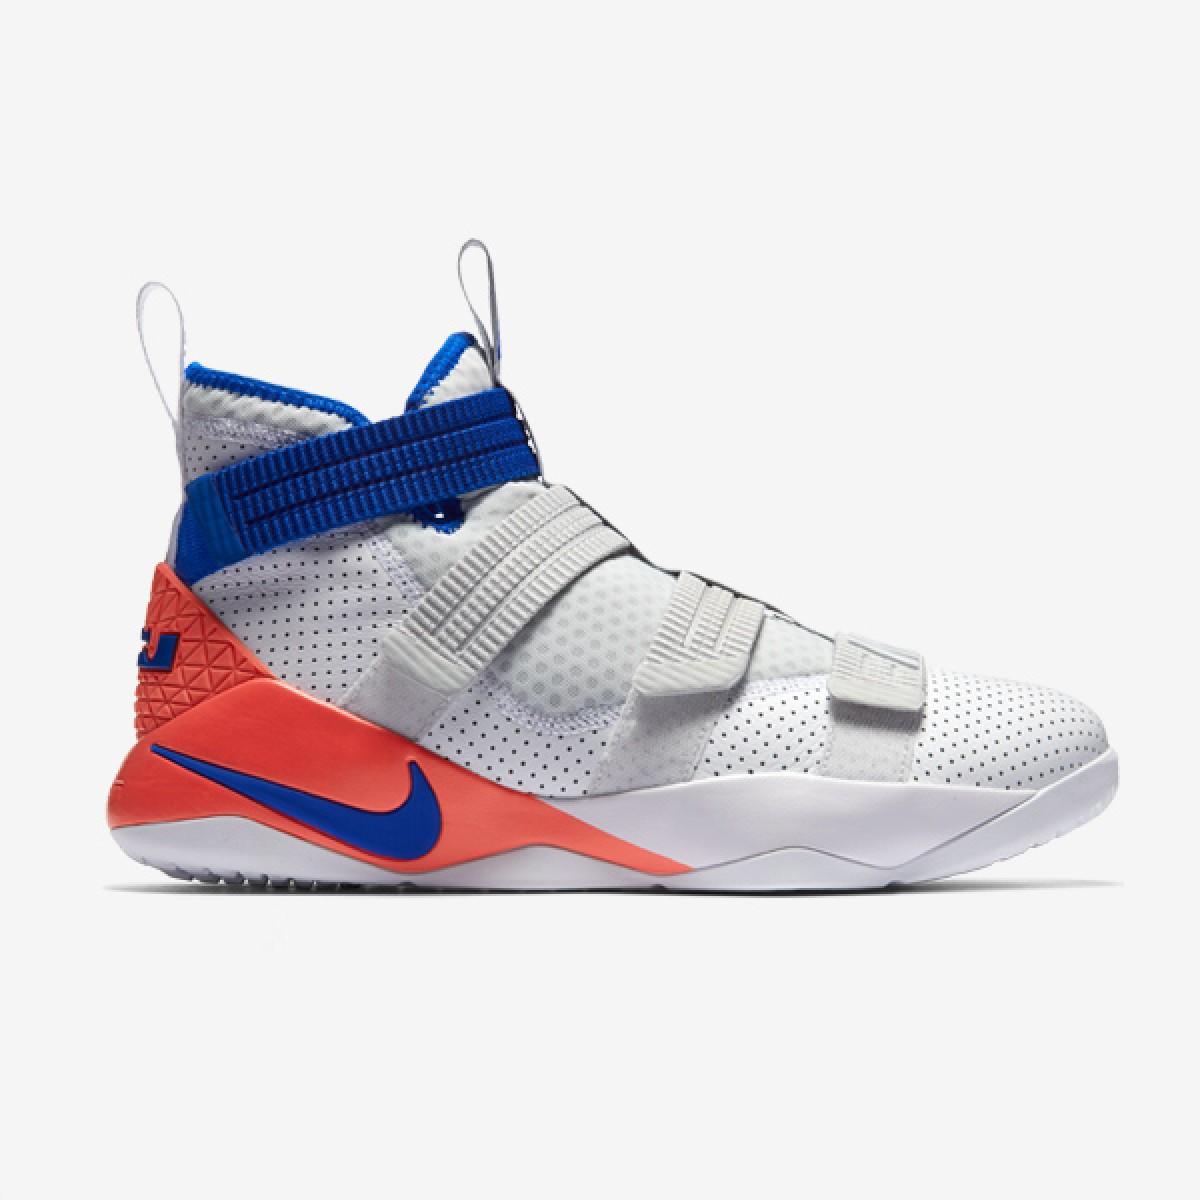 Nike Lebron Soldier XI SFG 'Ultramarine'